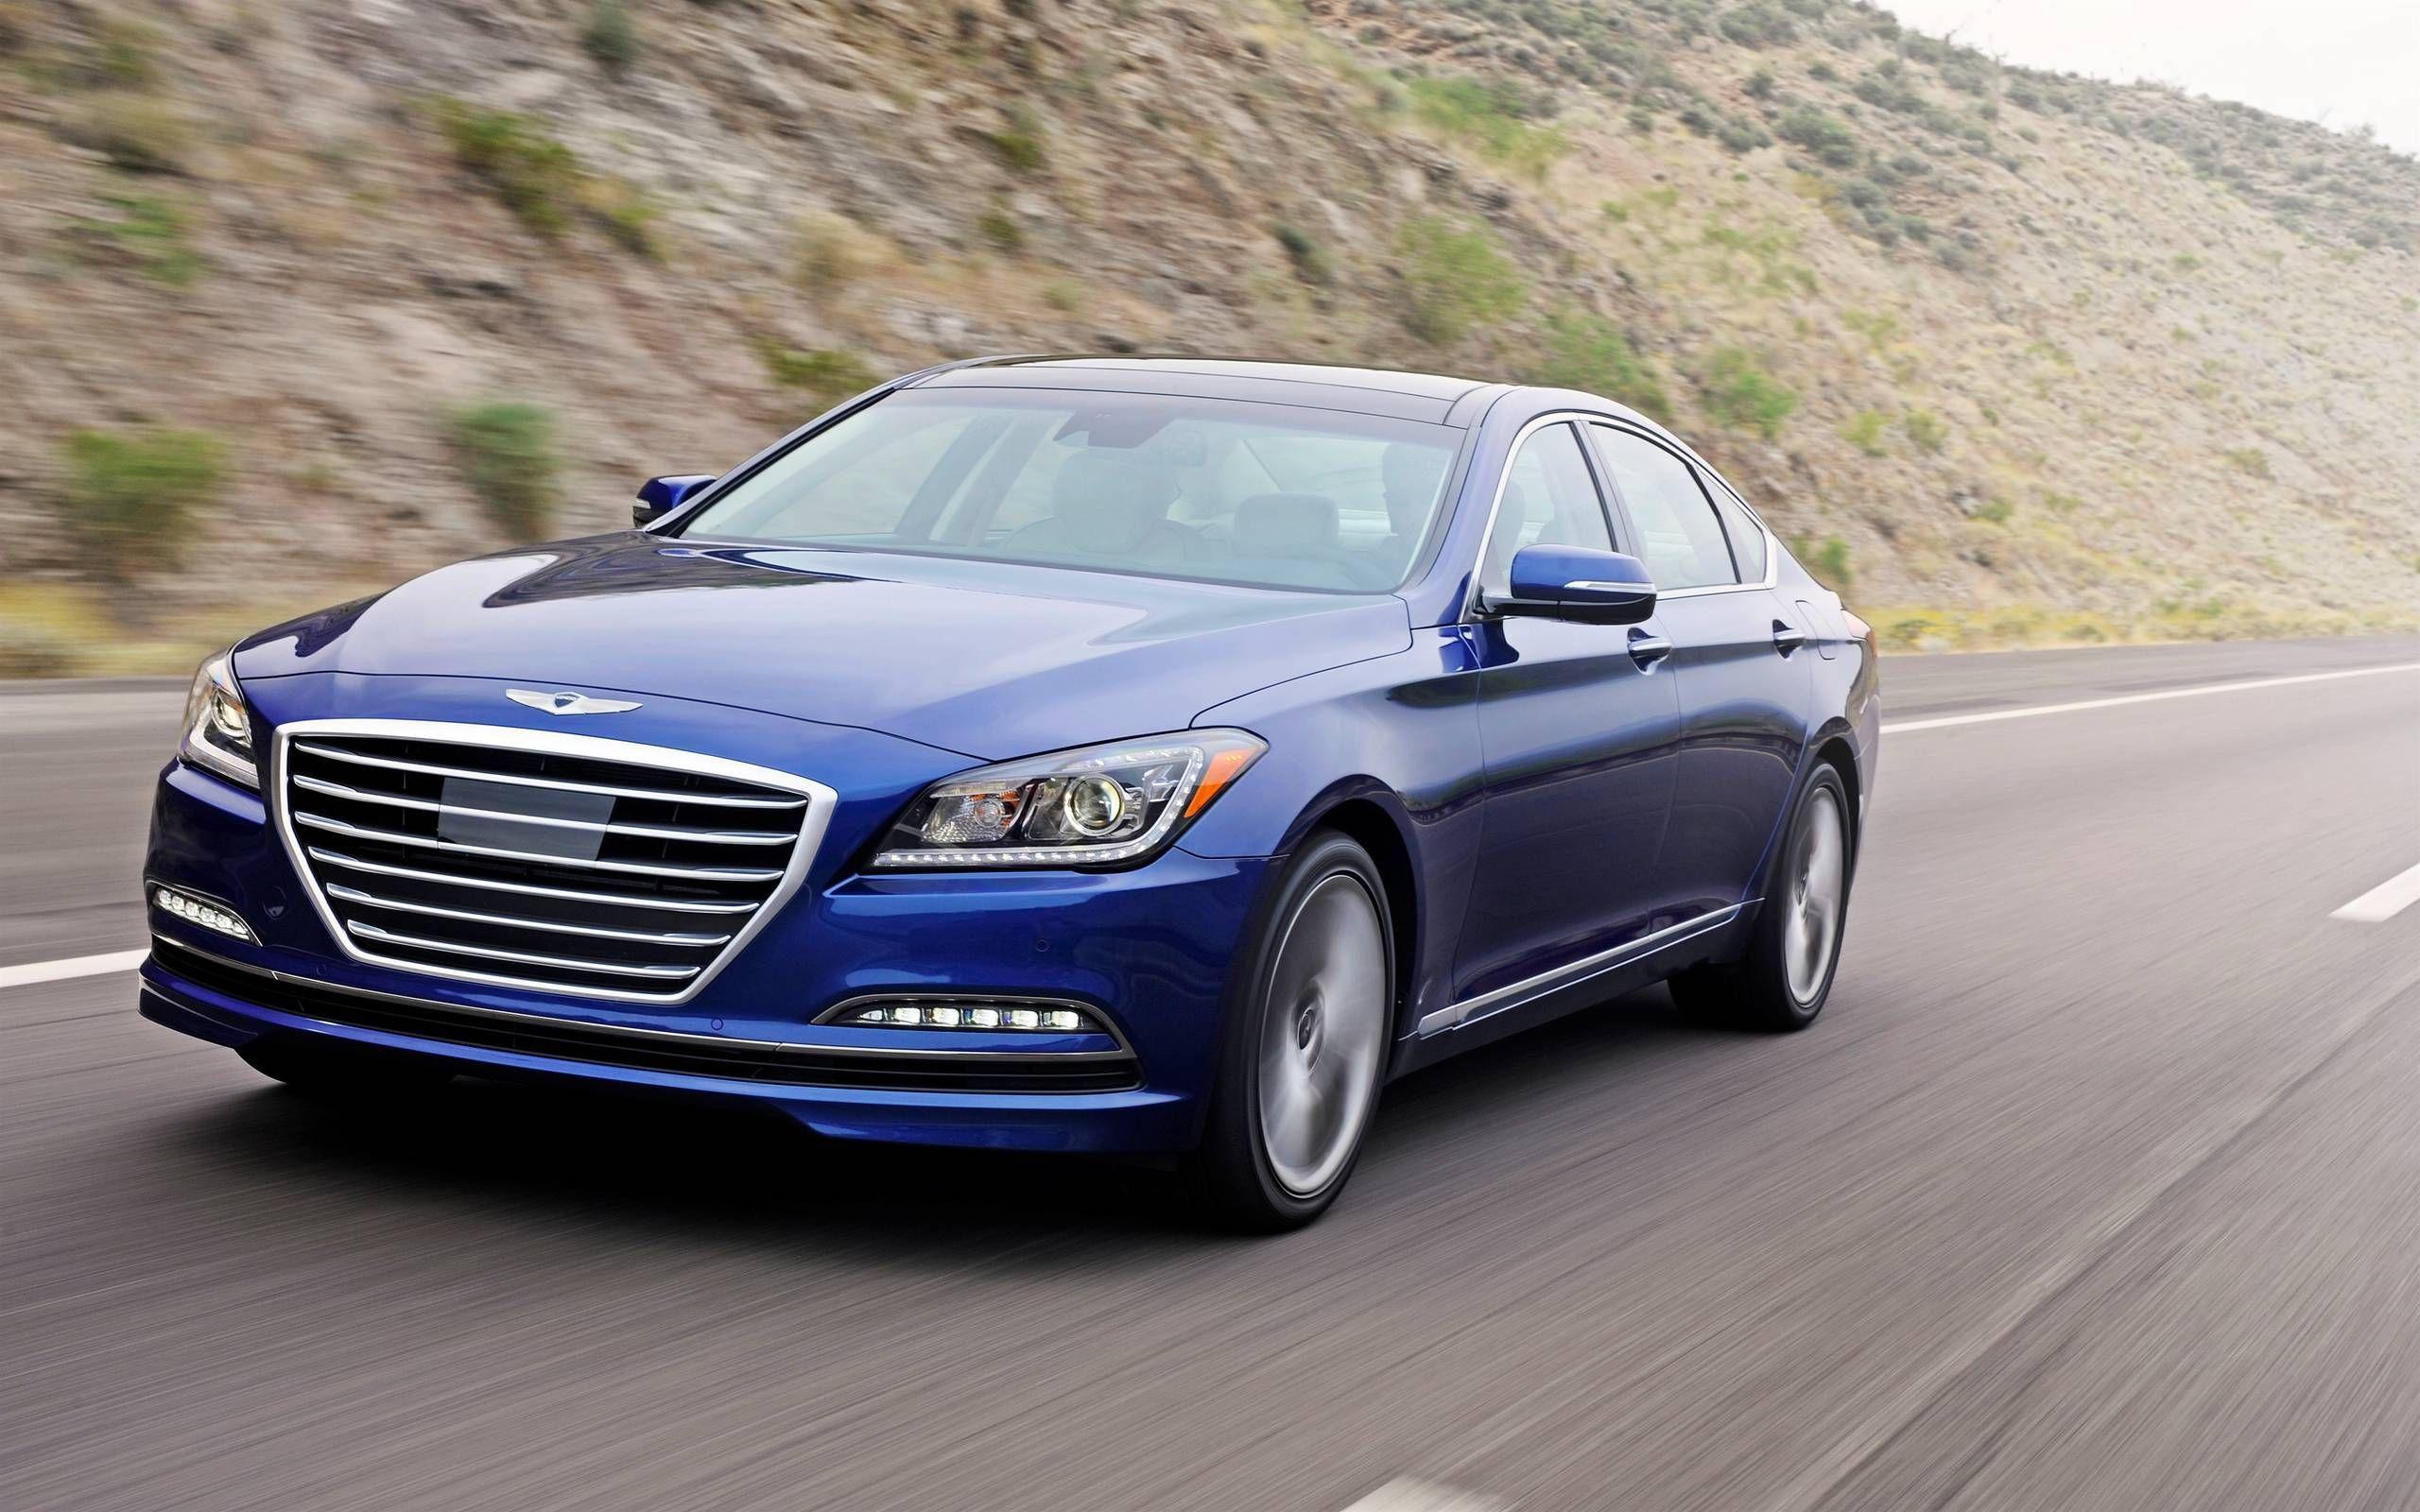 2015 Hyundai Genesis 3 8 Sedan Review Notes